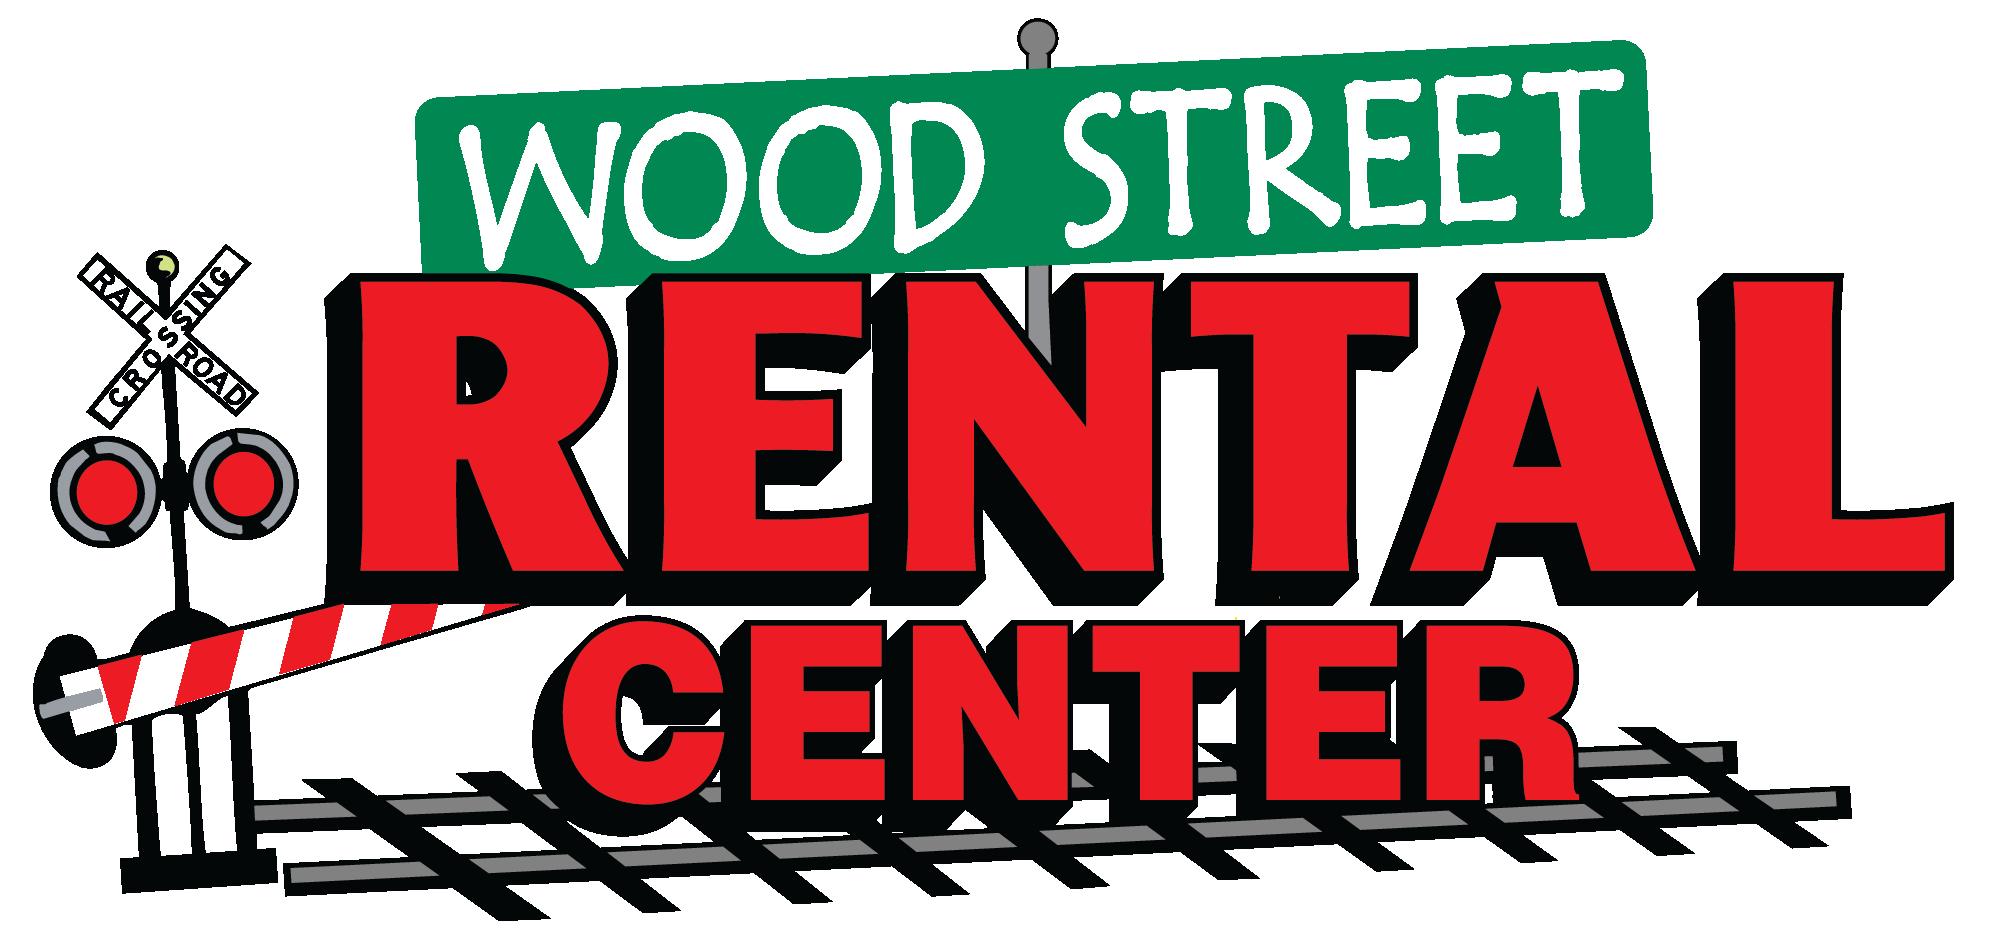 Wood Street Rental Center